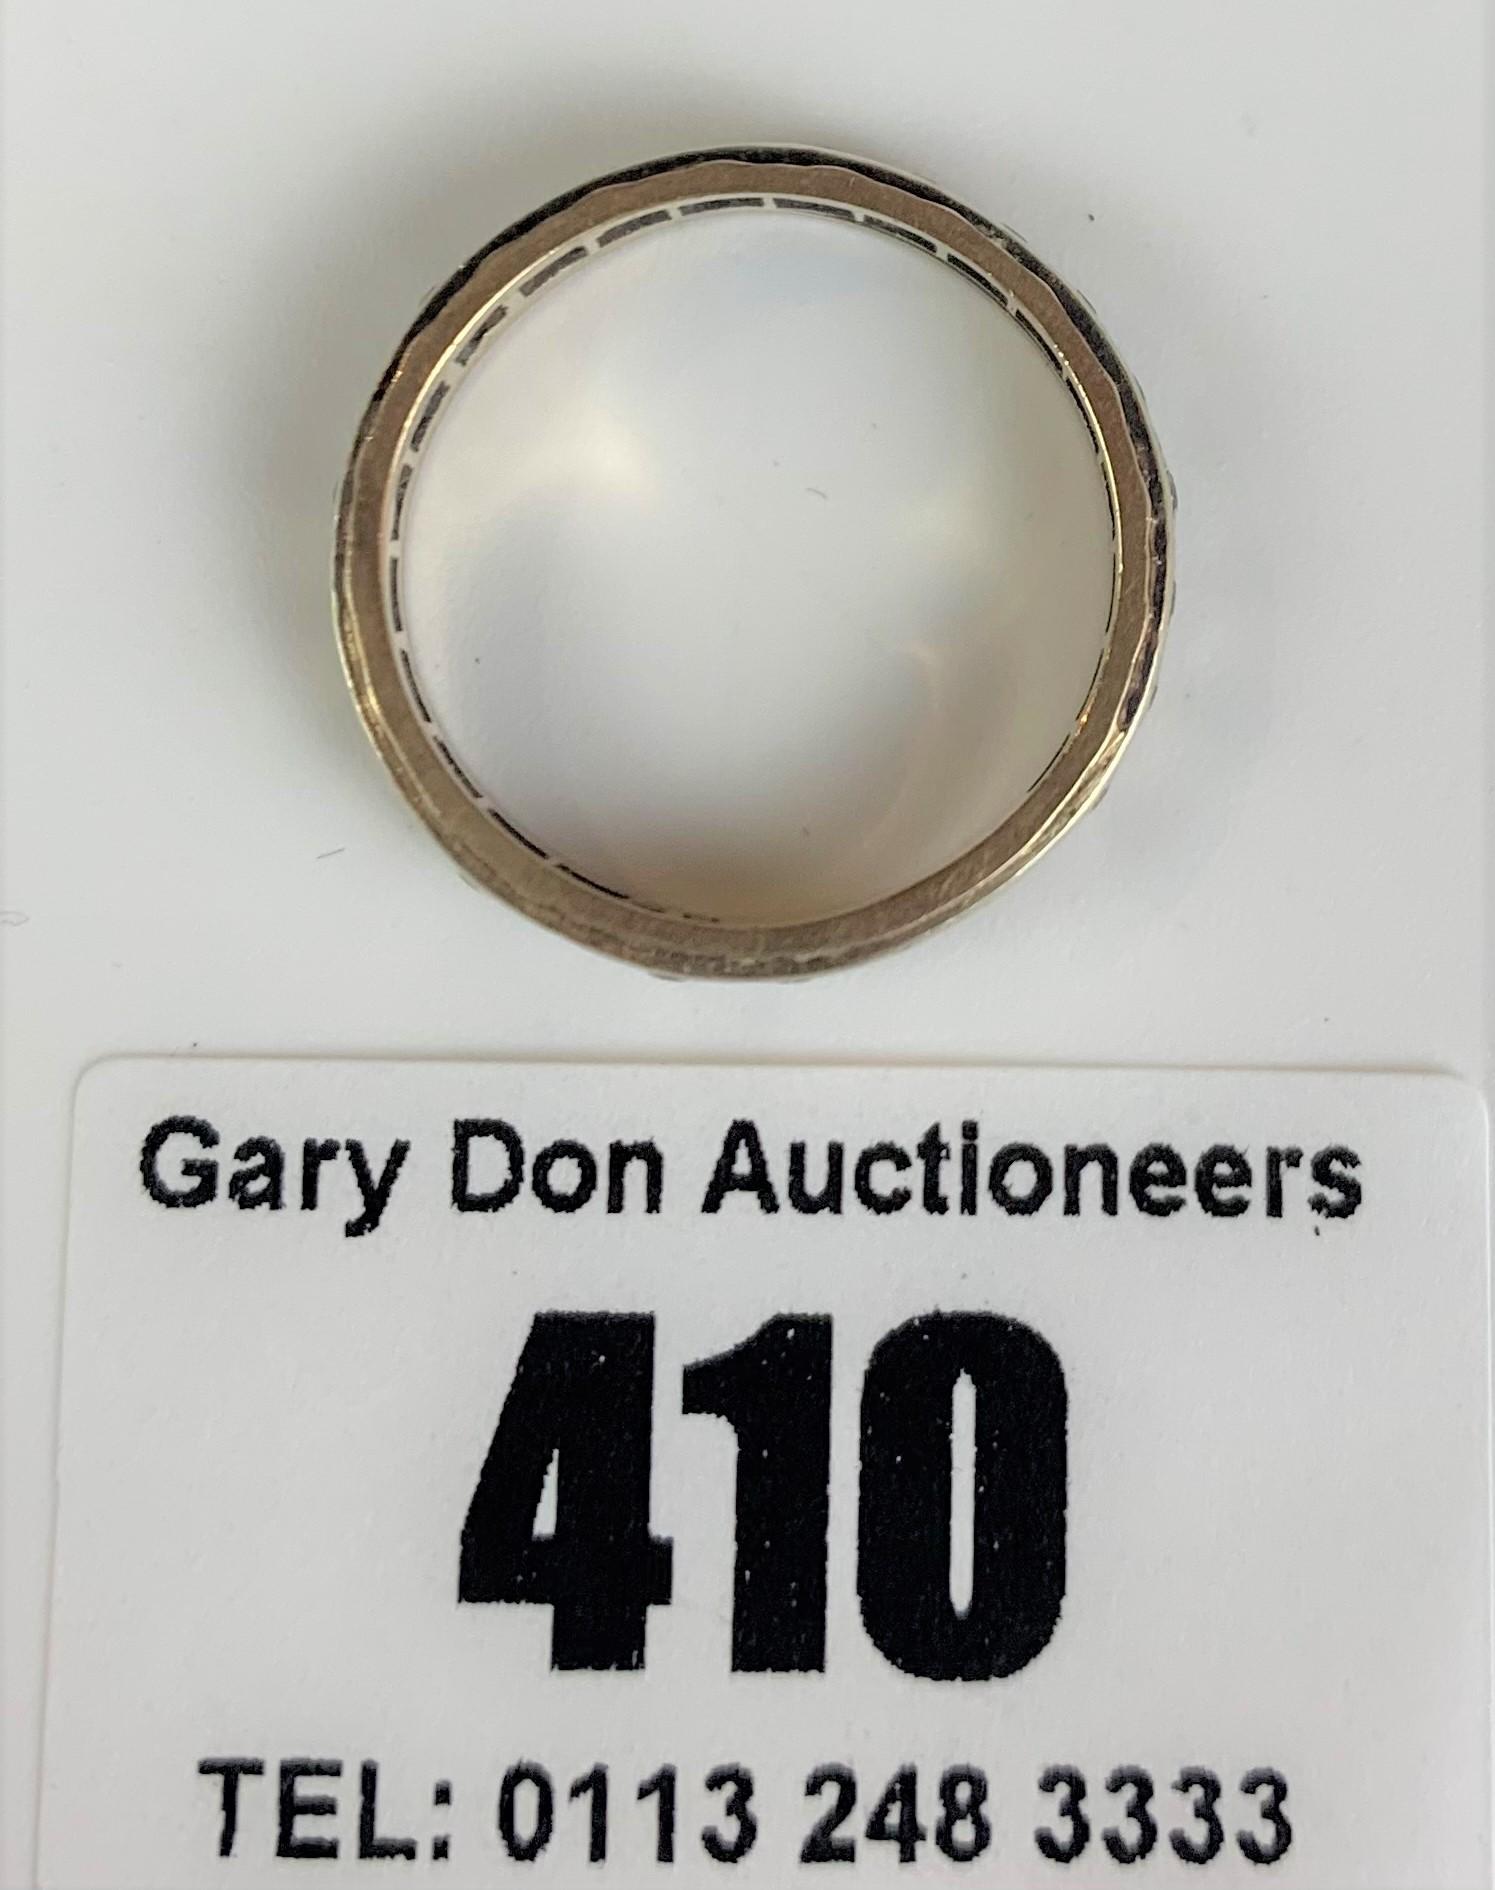 9k gold engraved ring, size N, w: 2.3 gms - Image 4 of 6